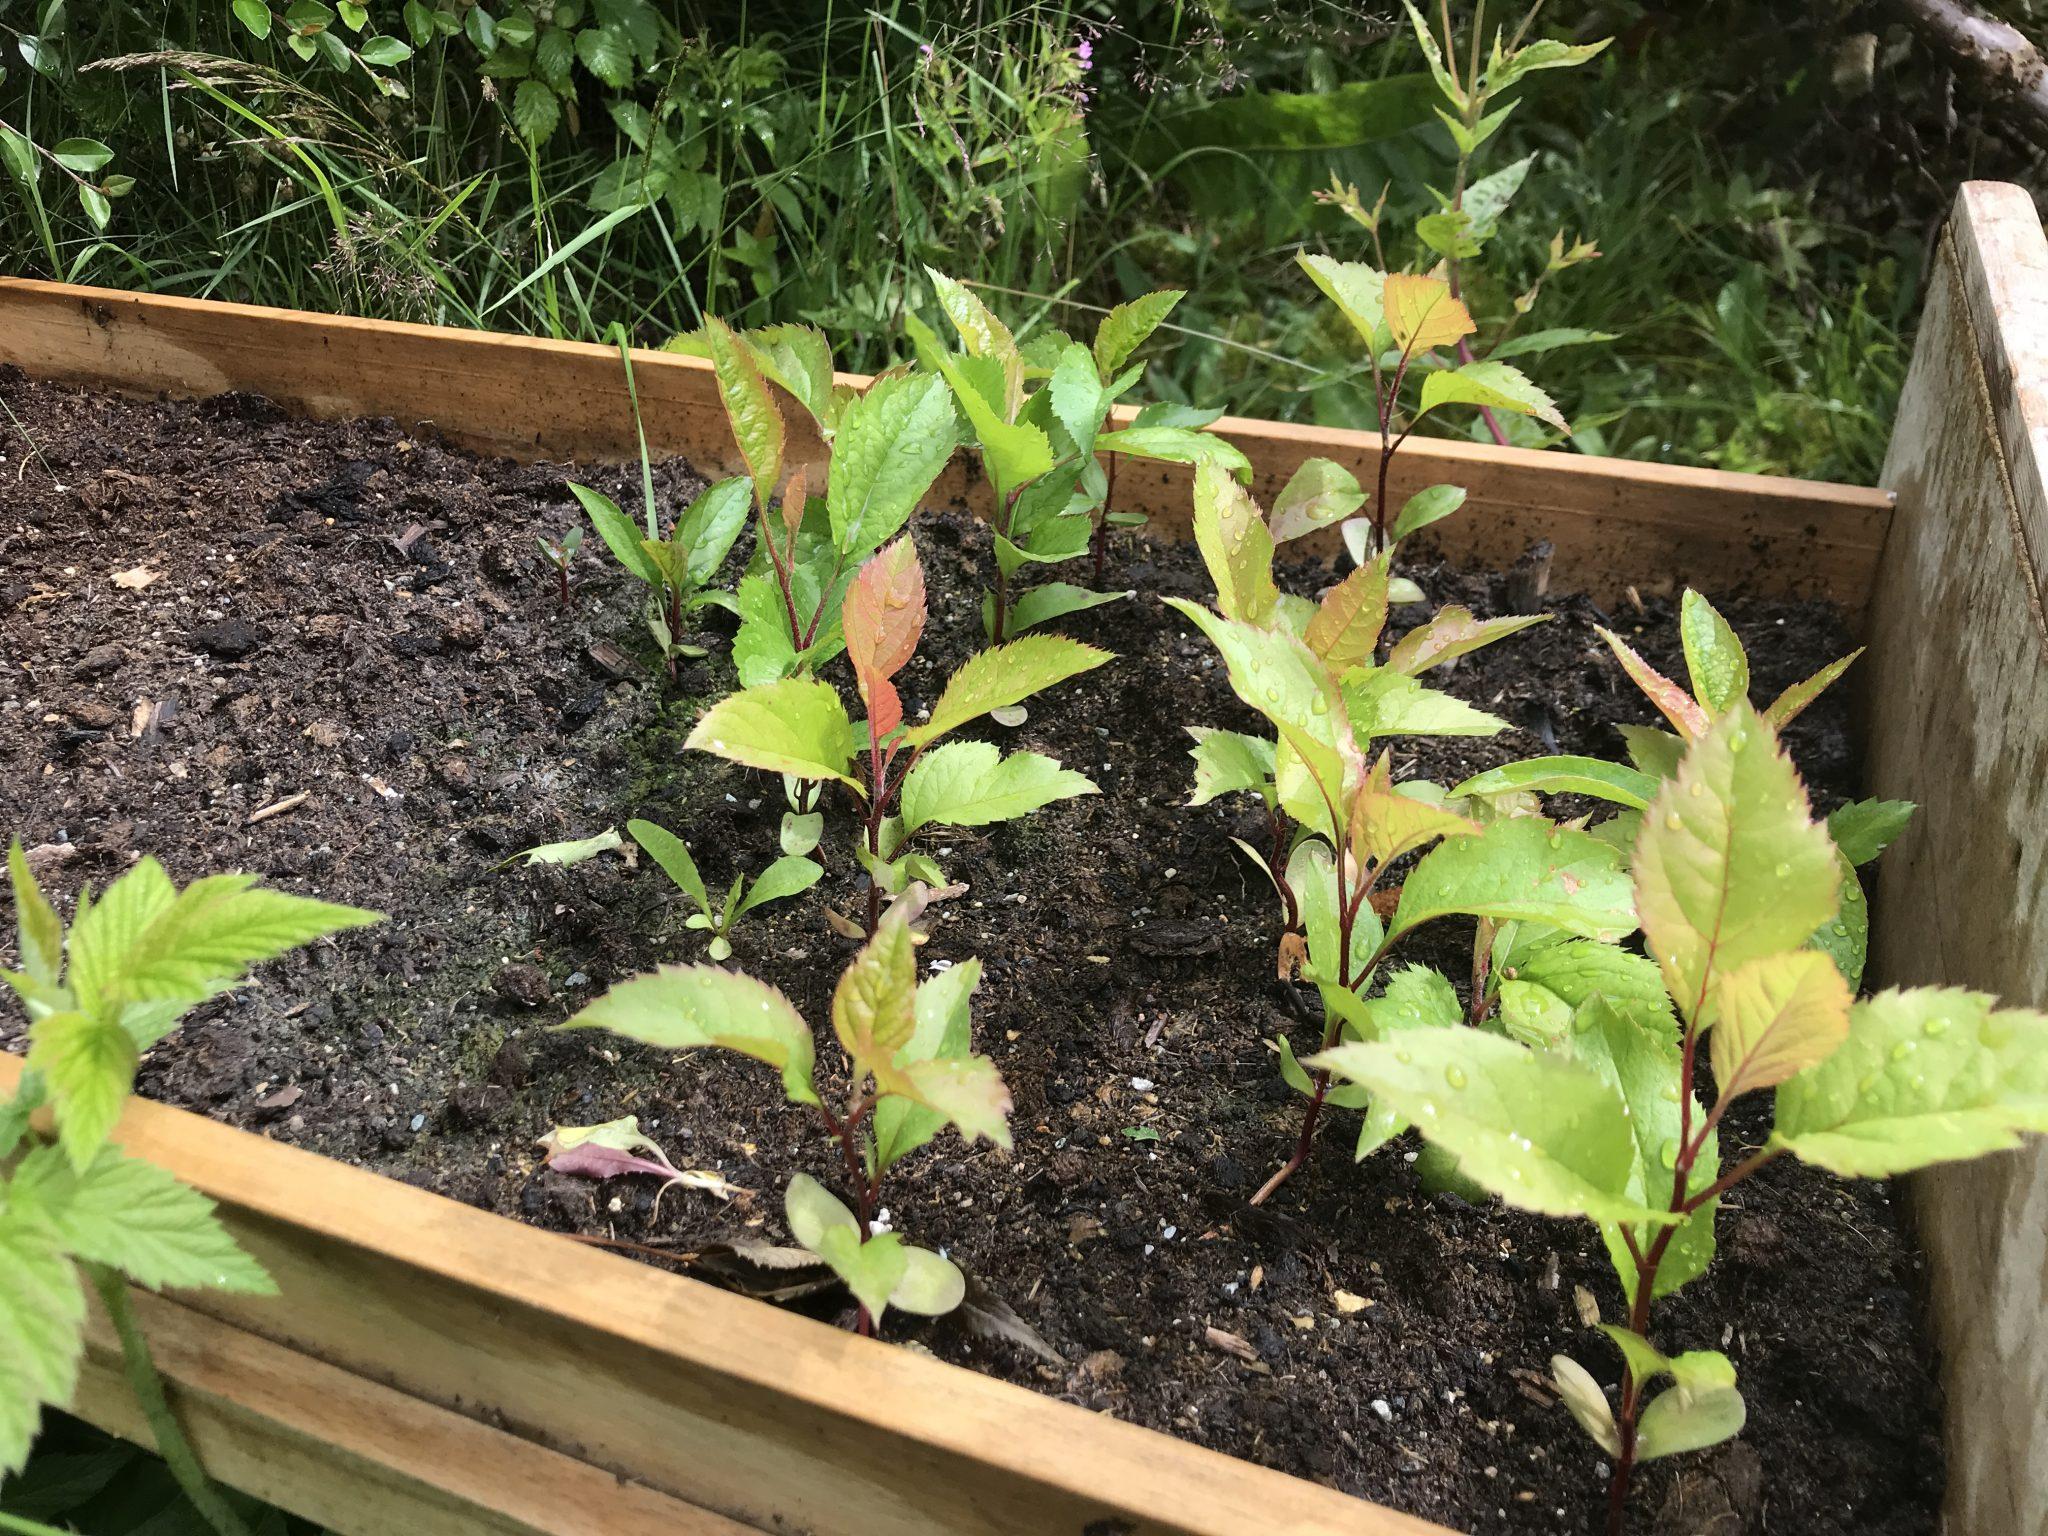 Apple tree seedlings